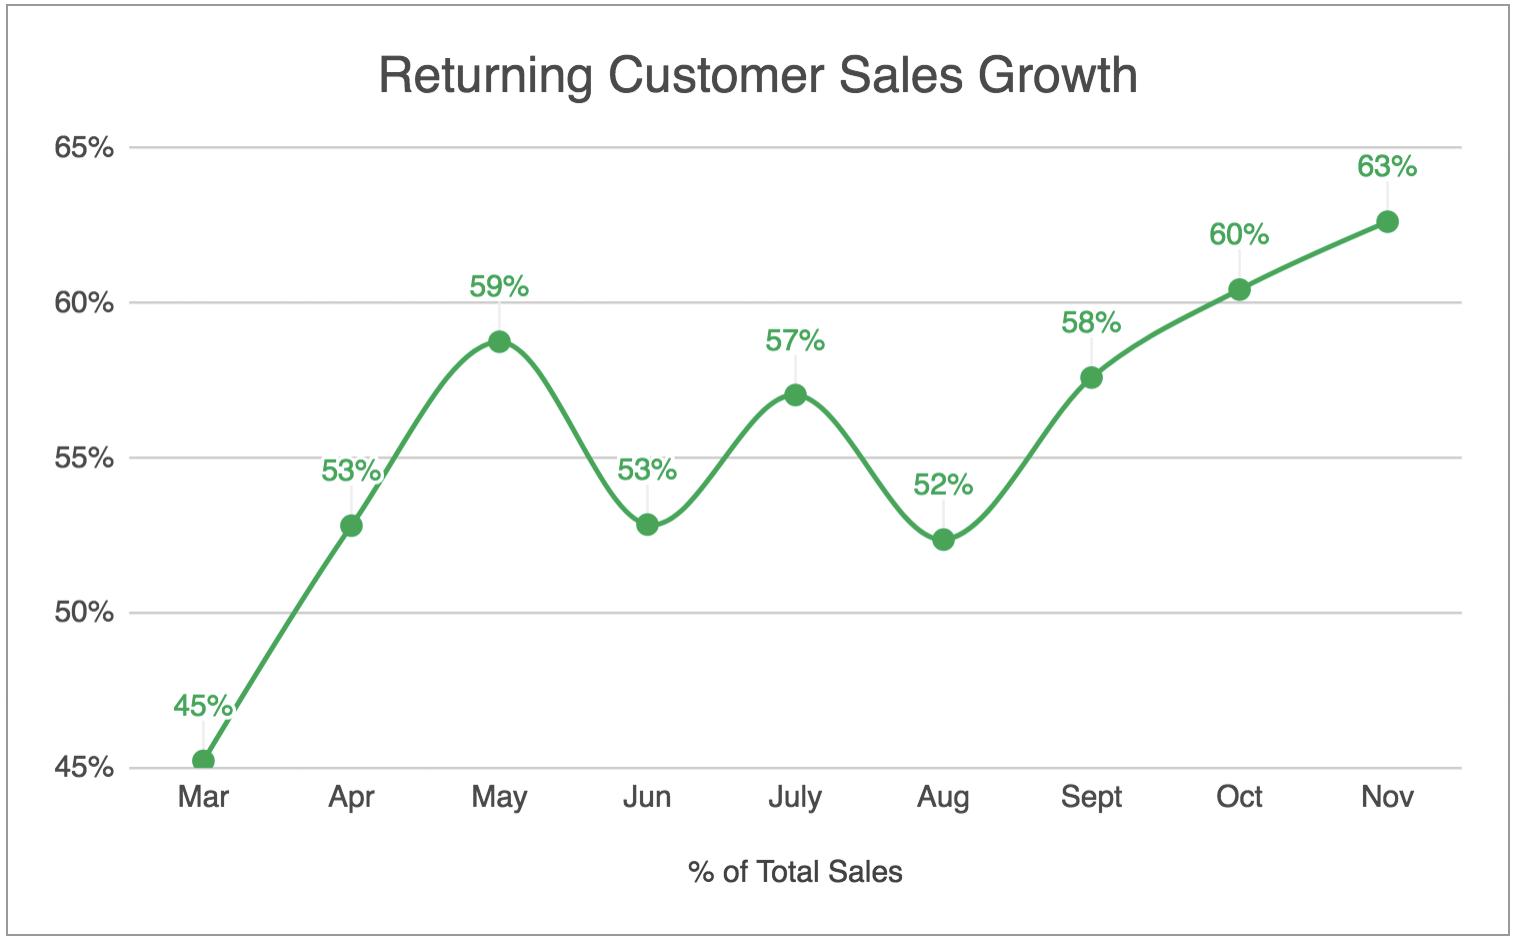 Retuning-Customer-Sales-Growth